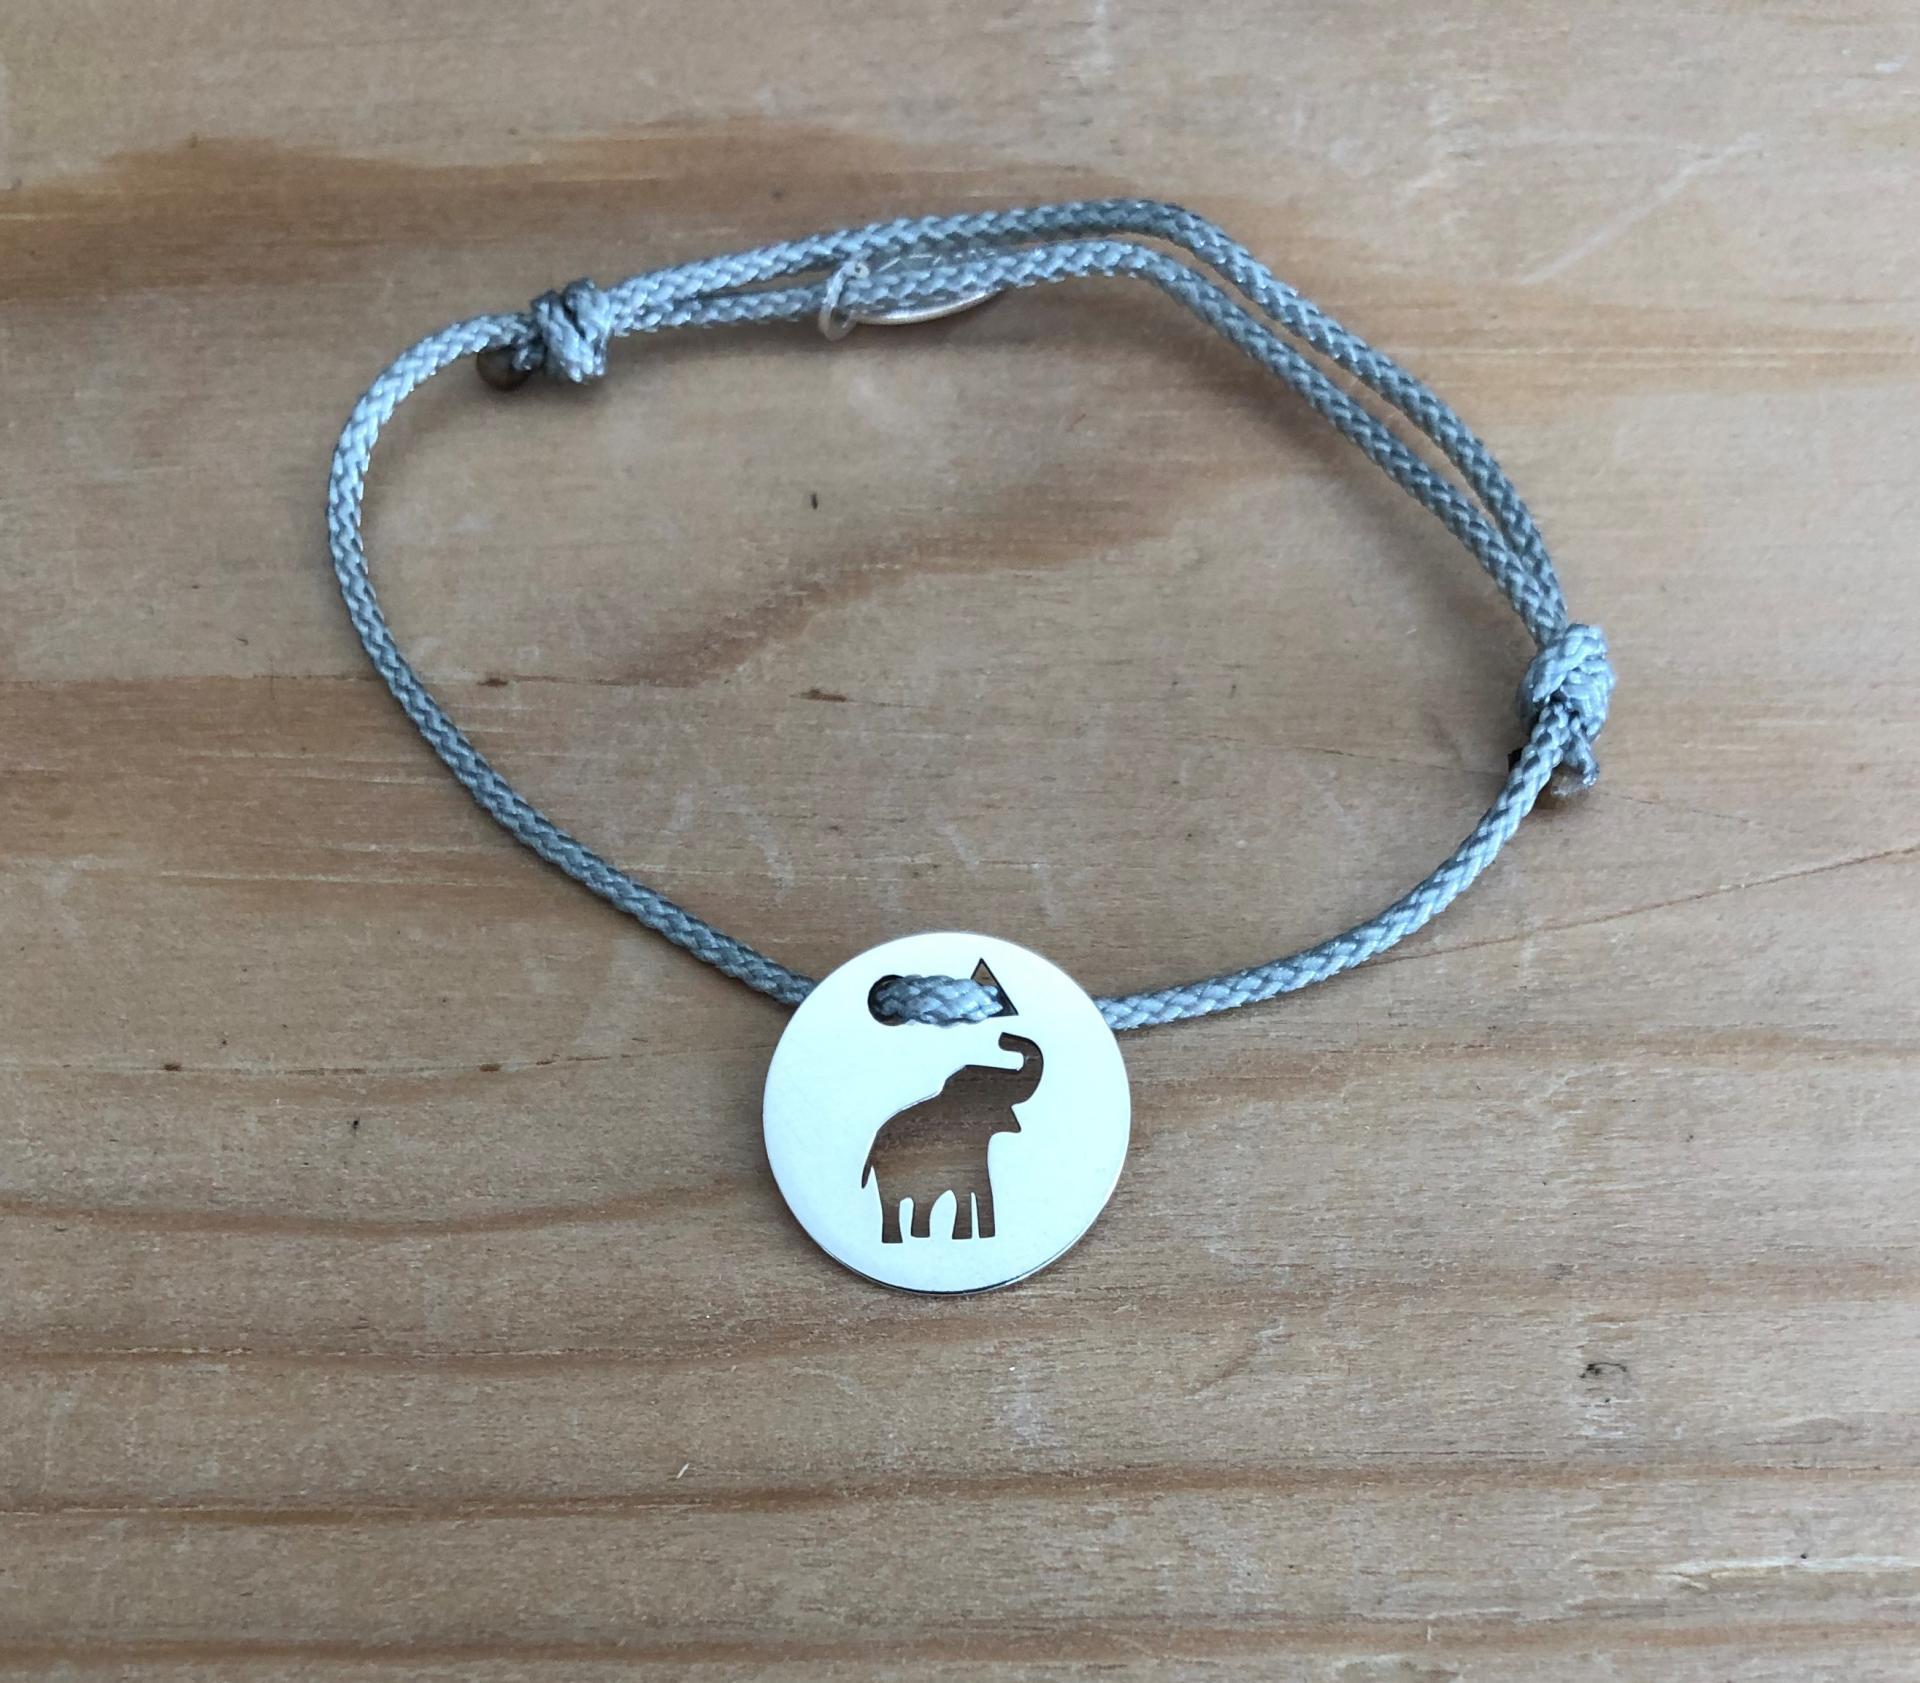 Elephanteau brac cordon